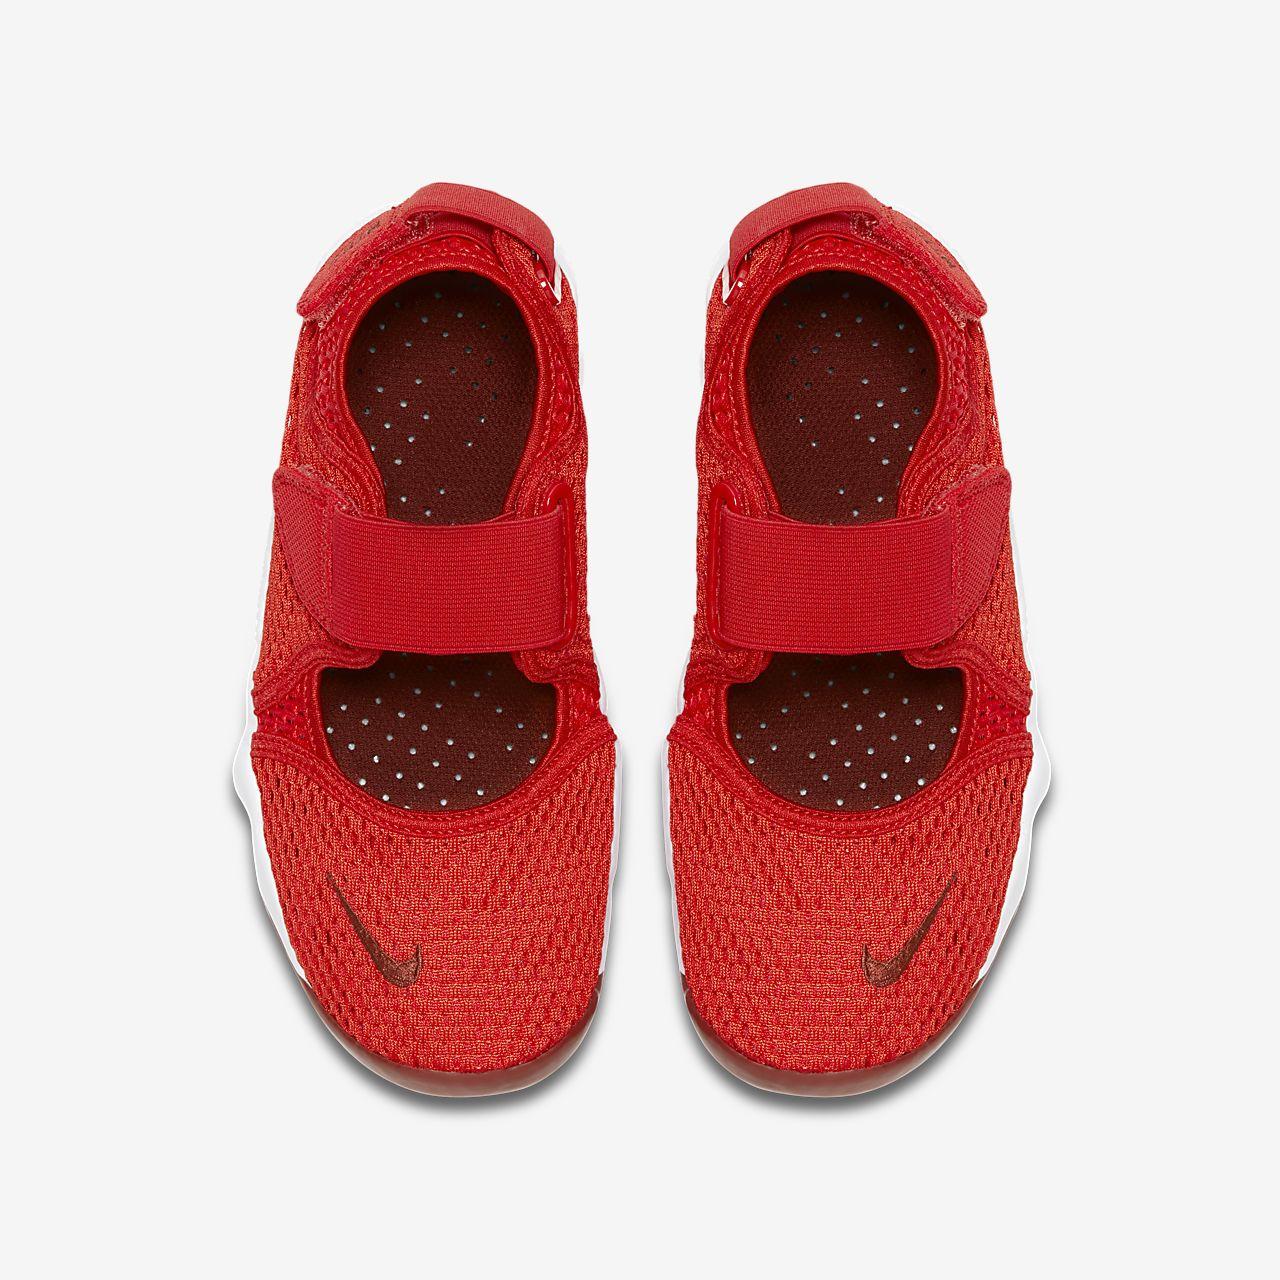 Nike Air Rift (10.5c-3y) Kids' Shoe